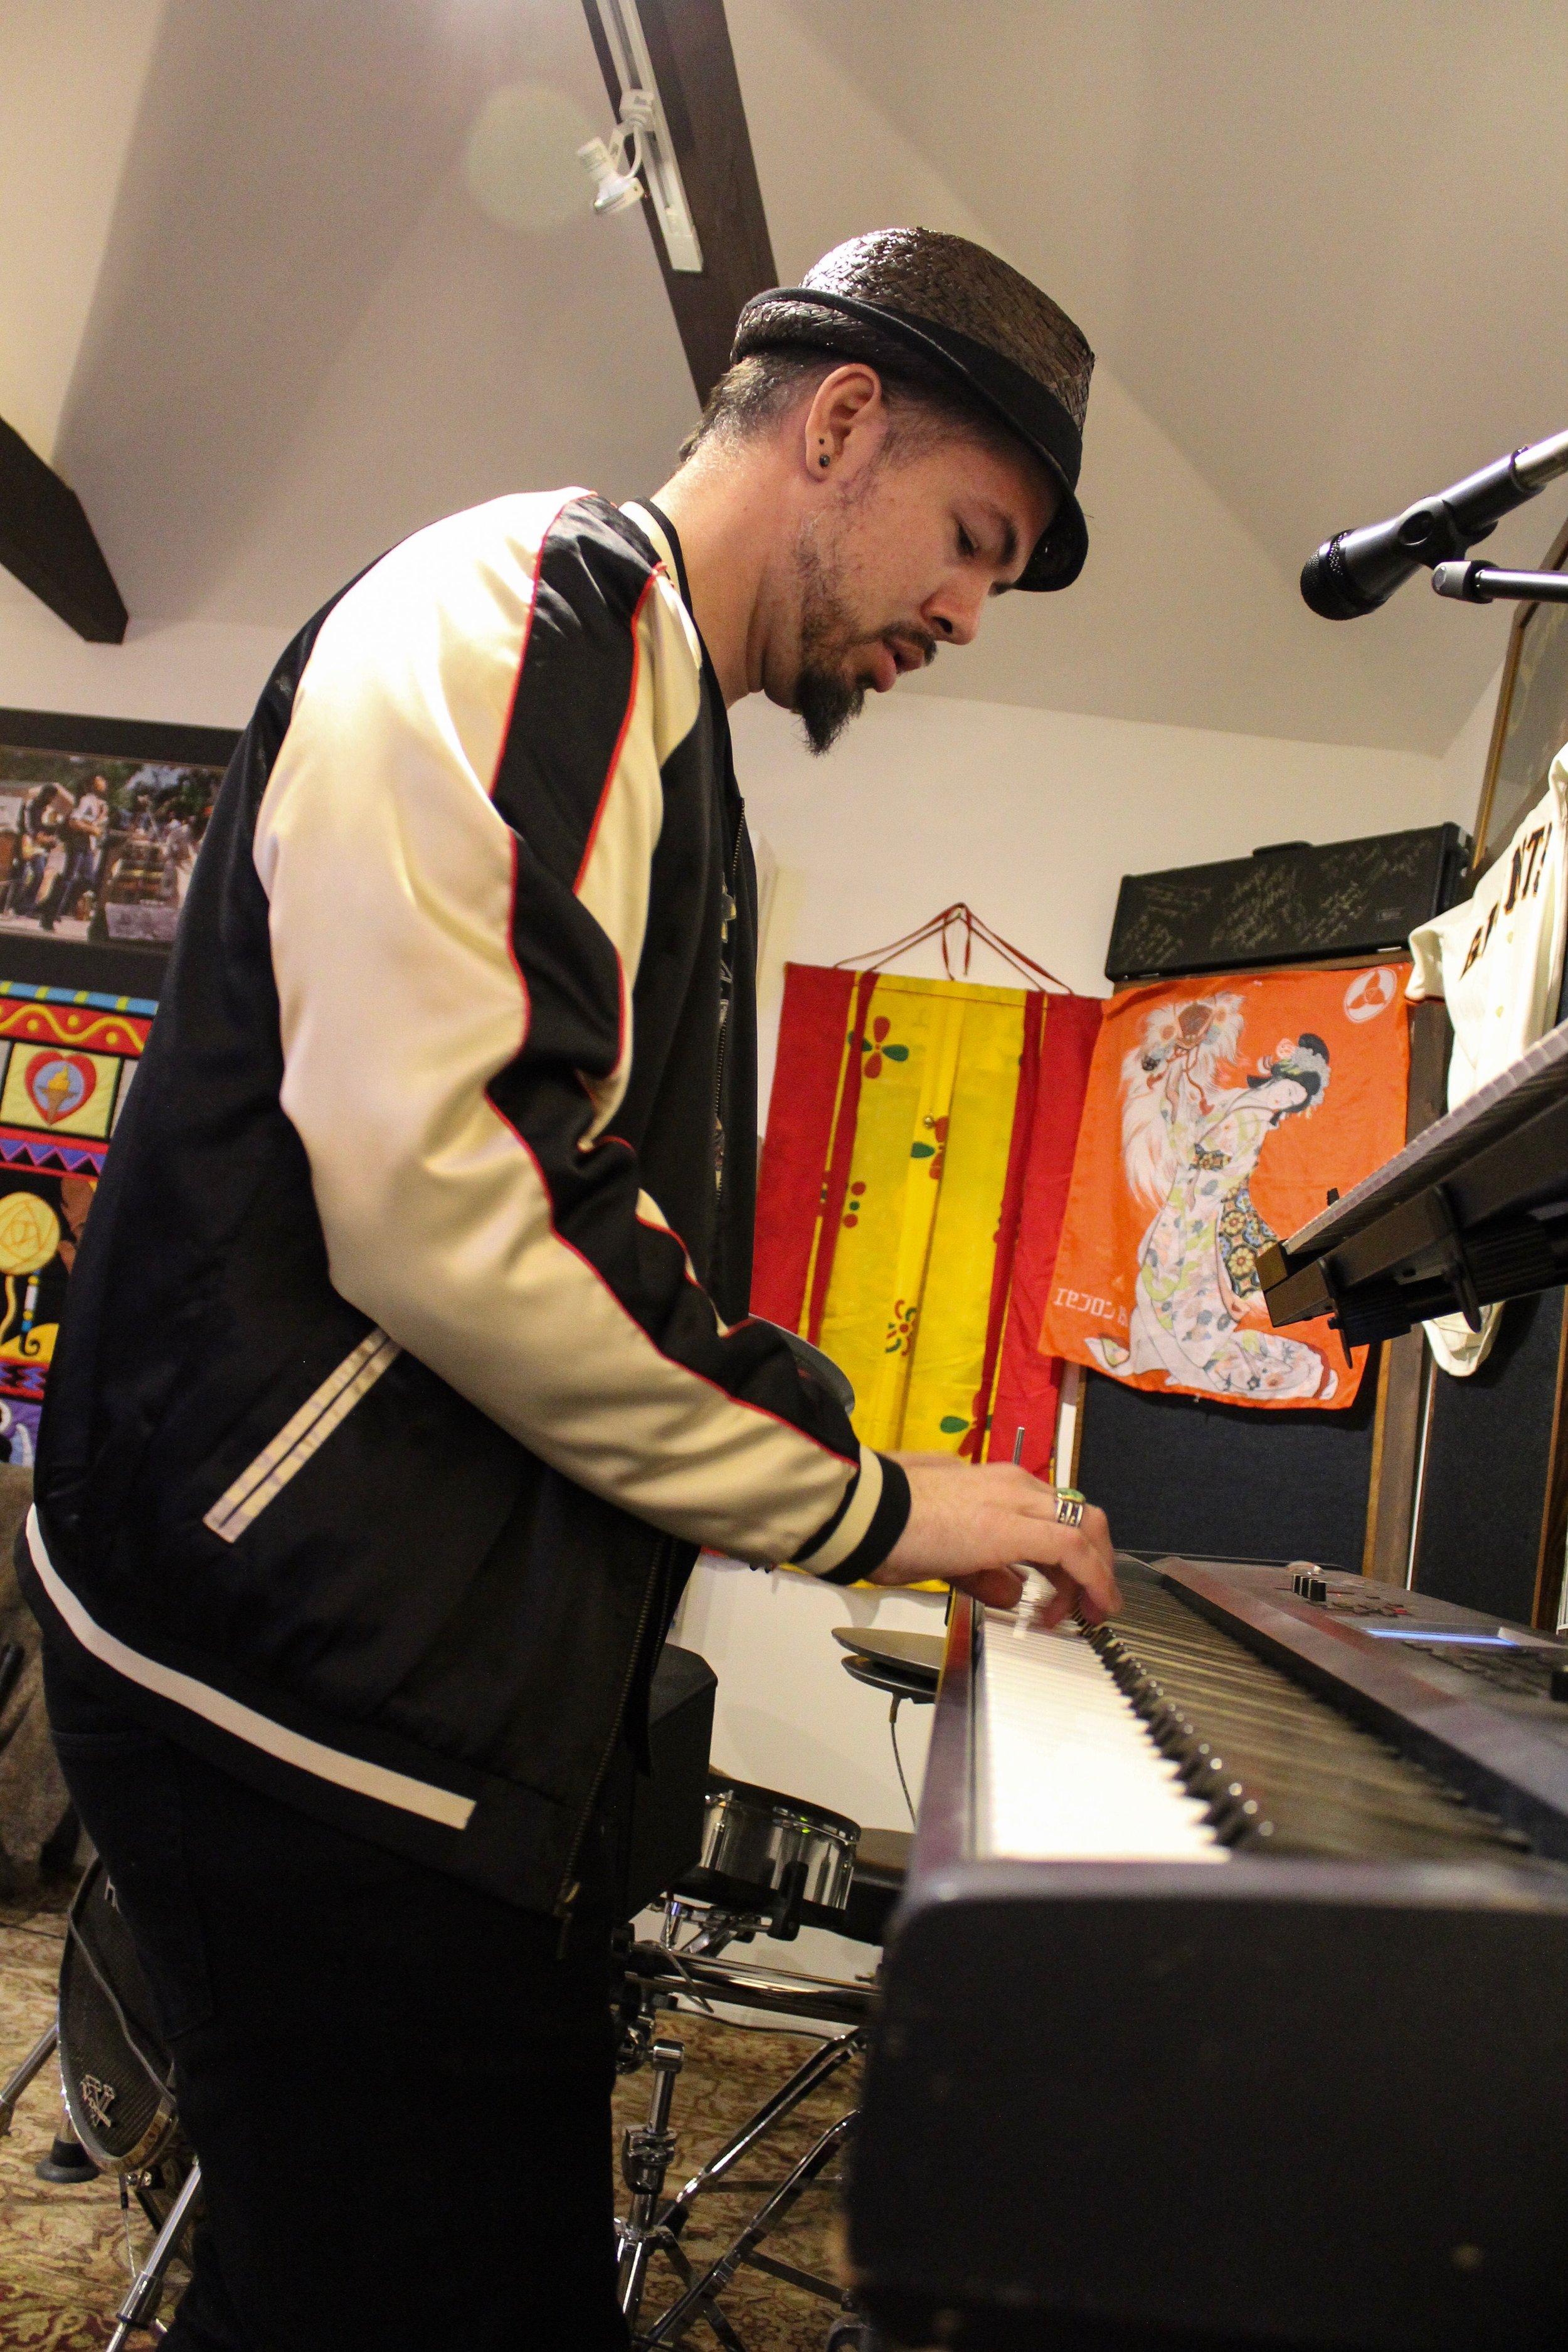 Salvador Santana playing keyboard by Roger Martinez